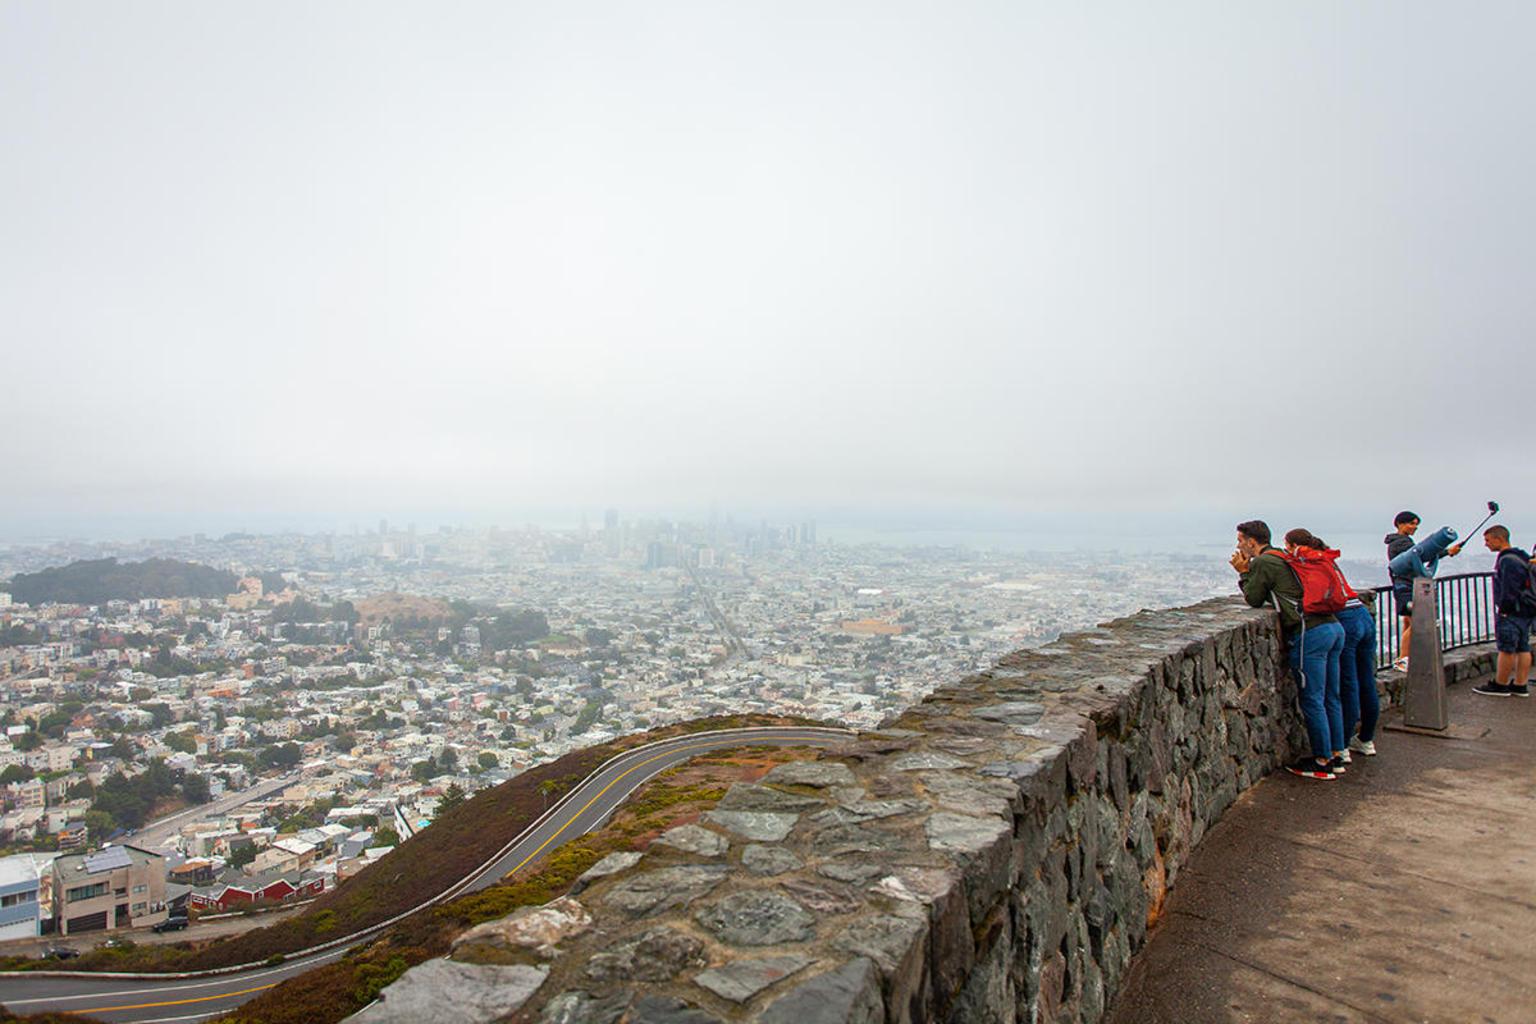 MÁS FOTOS, San Francisco Grand City Tour Including Free Walking Tour